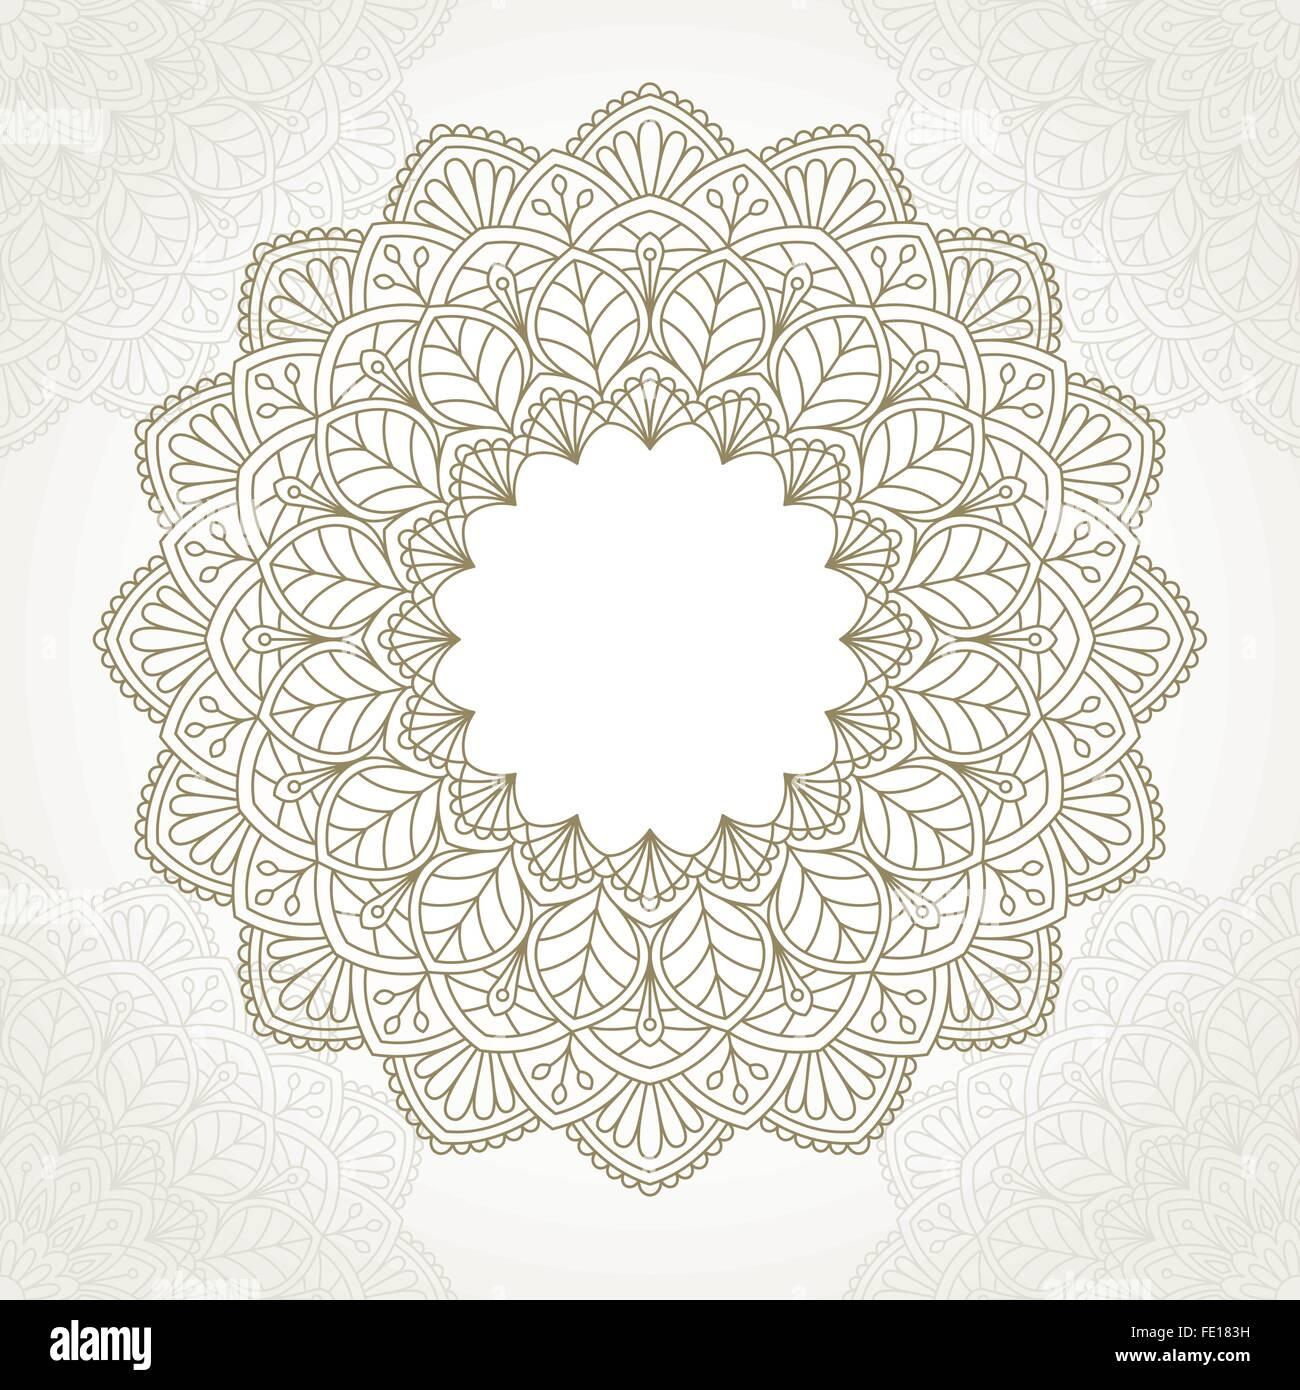 Ornamental round lace pattern. - Stock Image